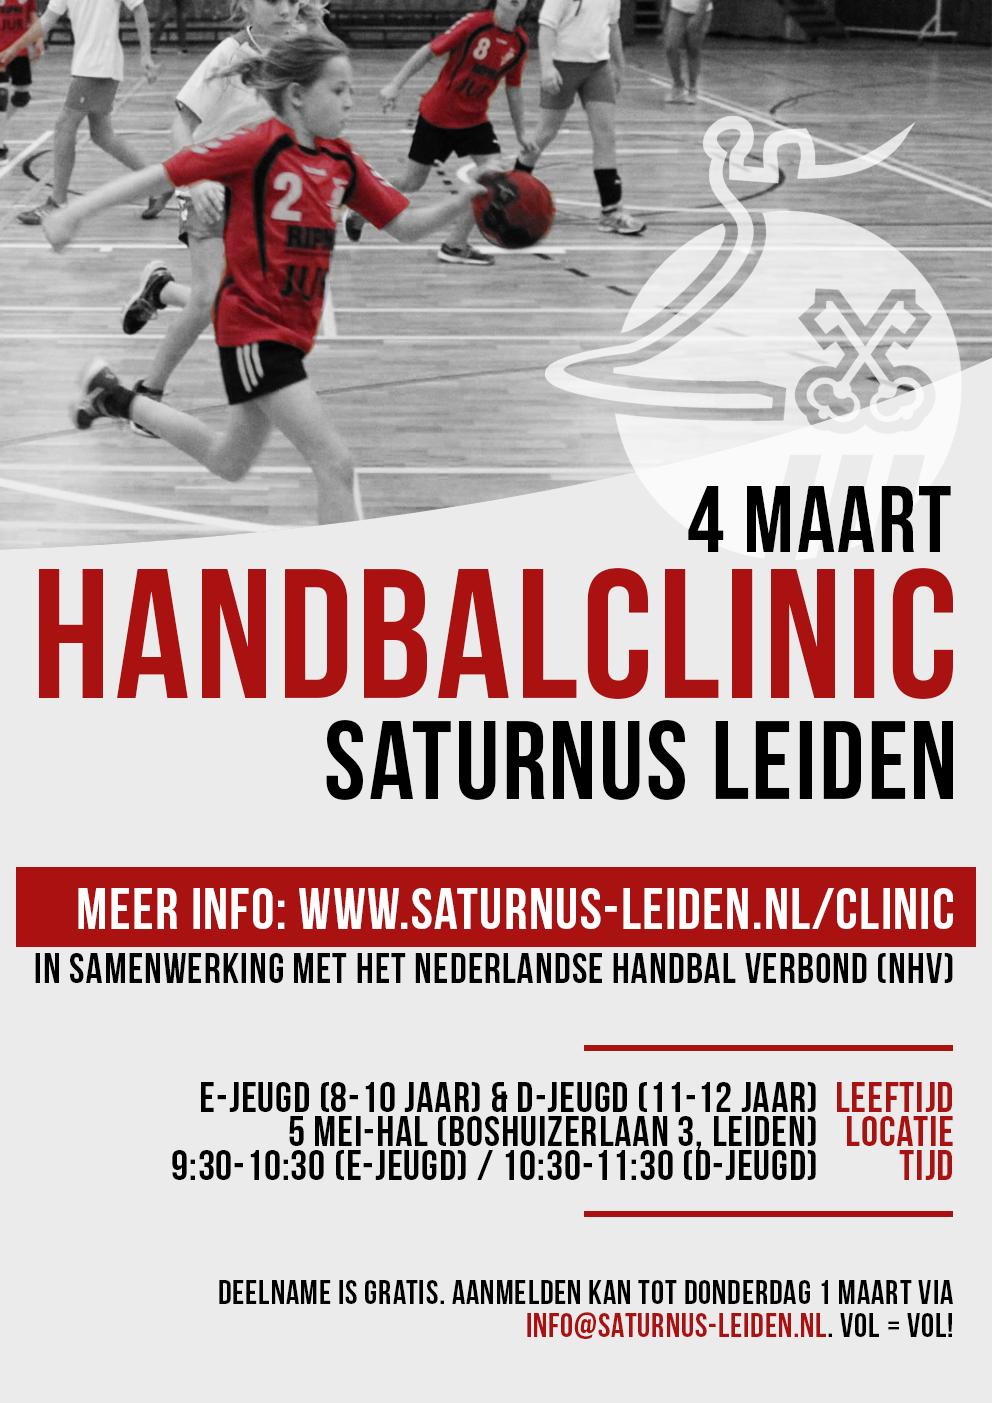 Handbalclinic 2018